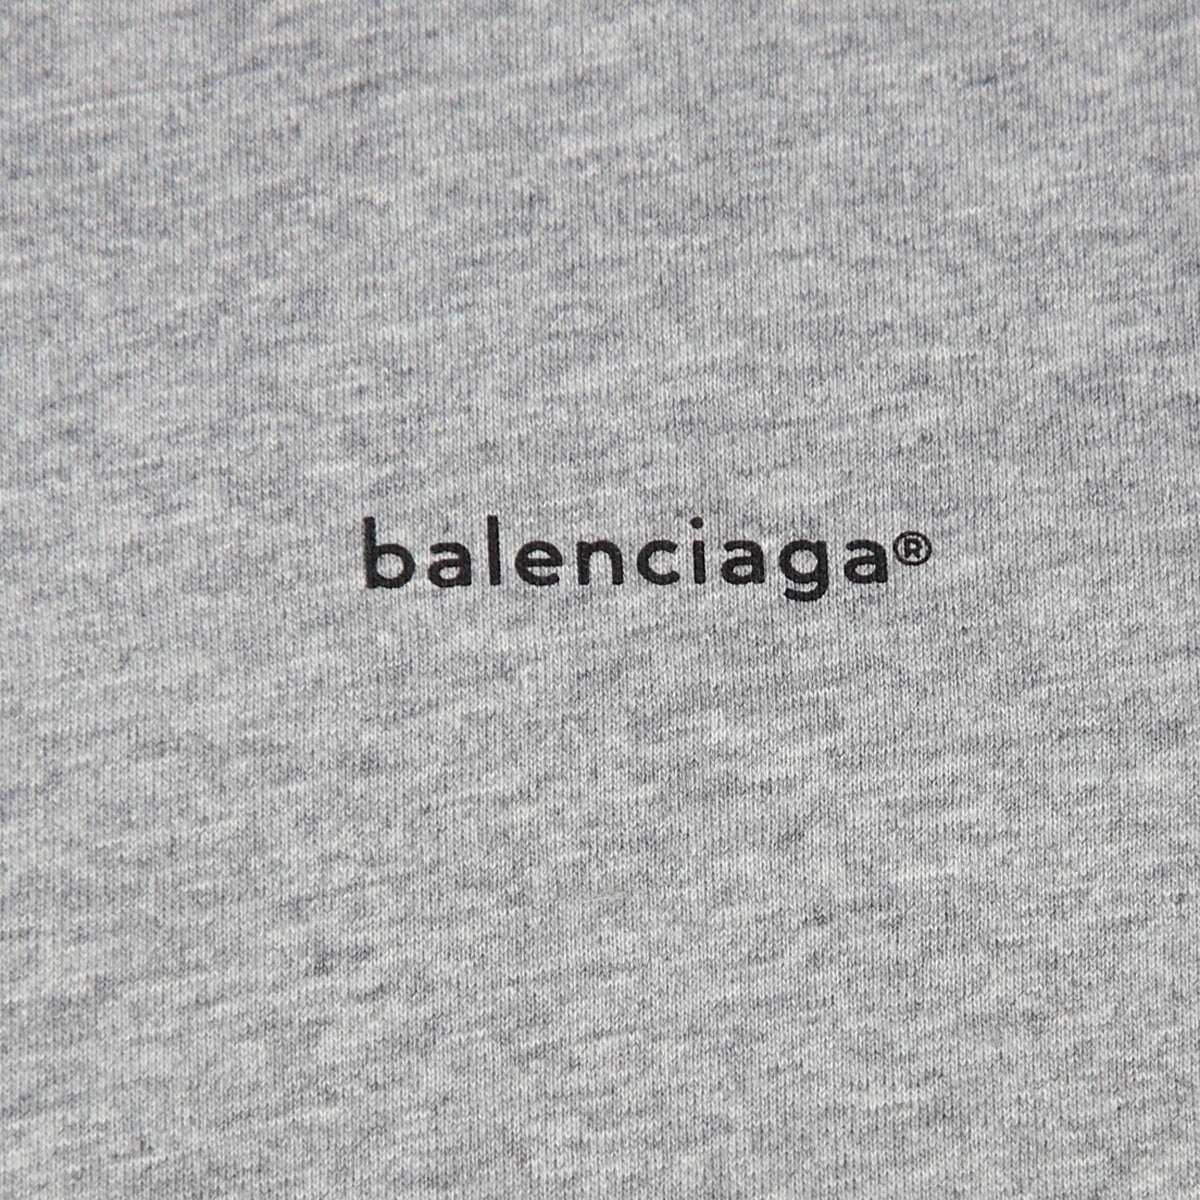 BALENCIAGA バレンシアガ クルーネック 半袖Tシャツ メンズ